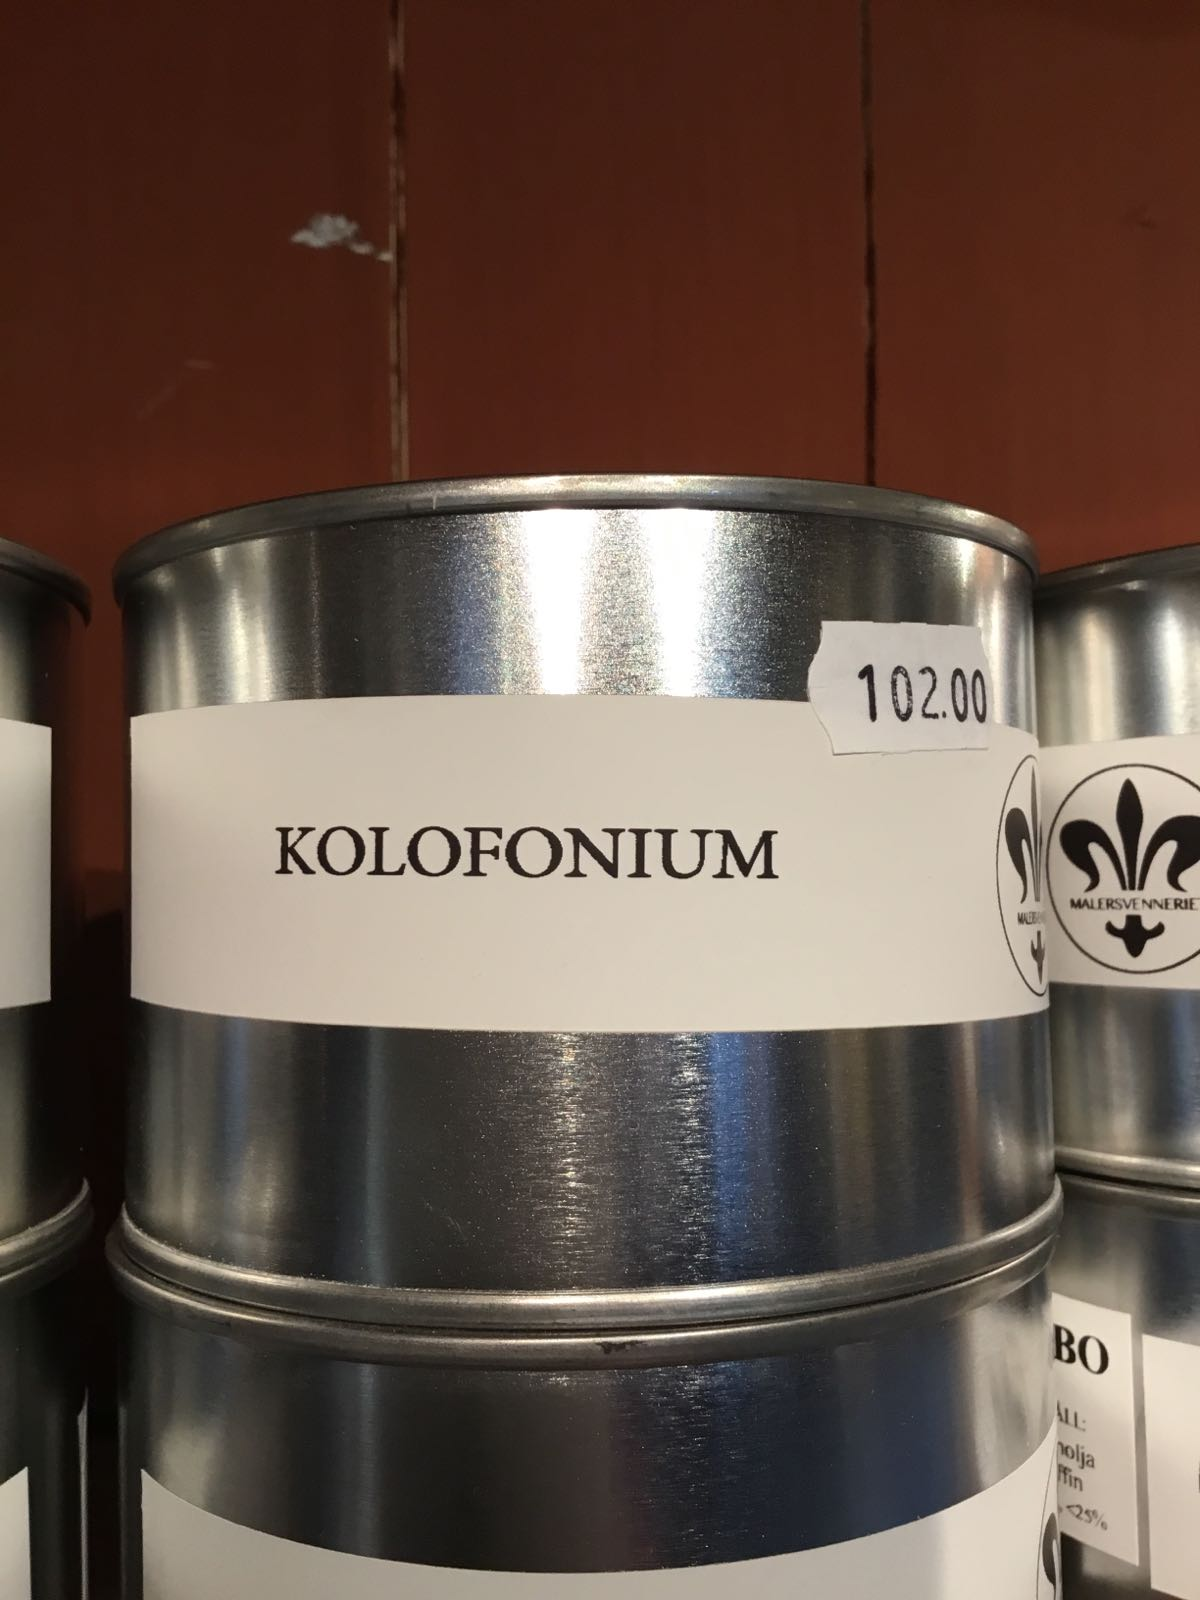 Kolofonium